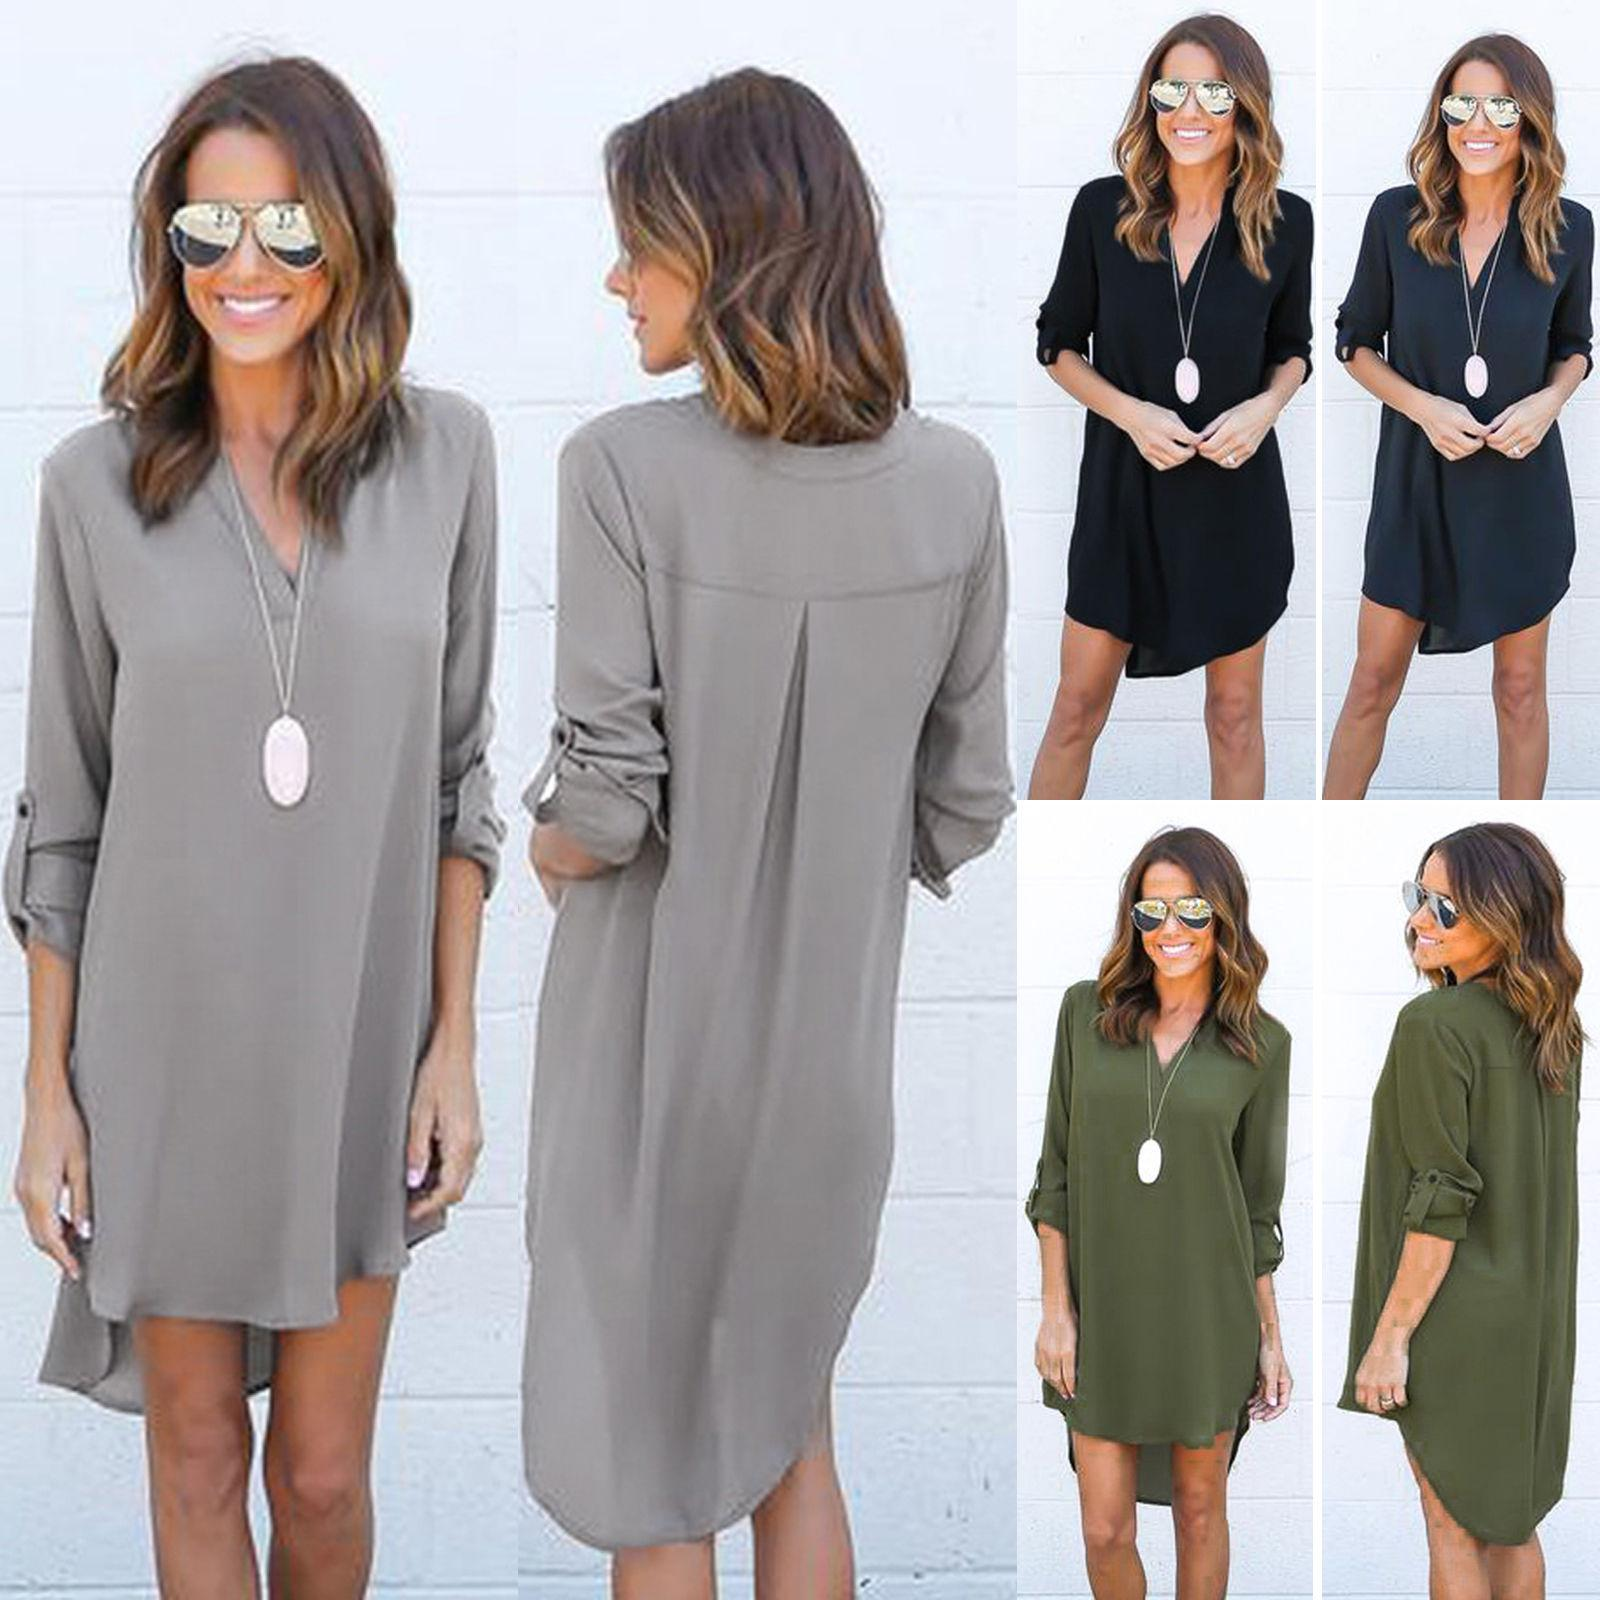 881e5538a7 Womens Chiffon Blouses Long Sleeve T Shirt Ladies Tee Shirt Casual Loose  Irregular High Low Short Dress Tops White Dress Womens Short Long Dress  From ...